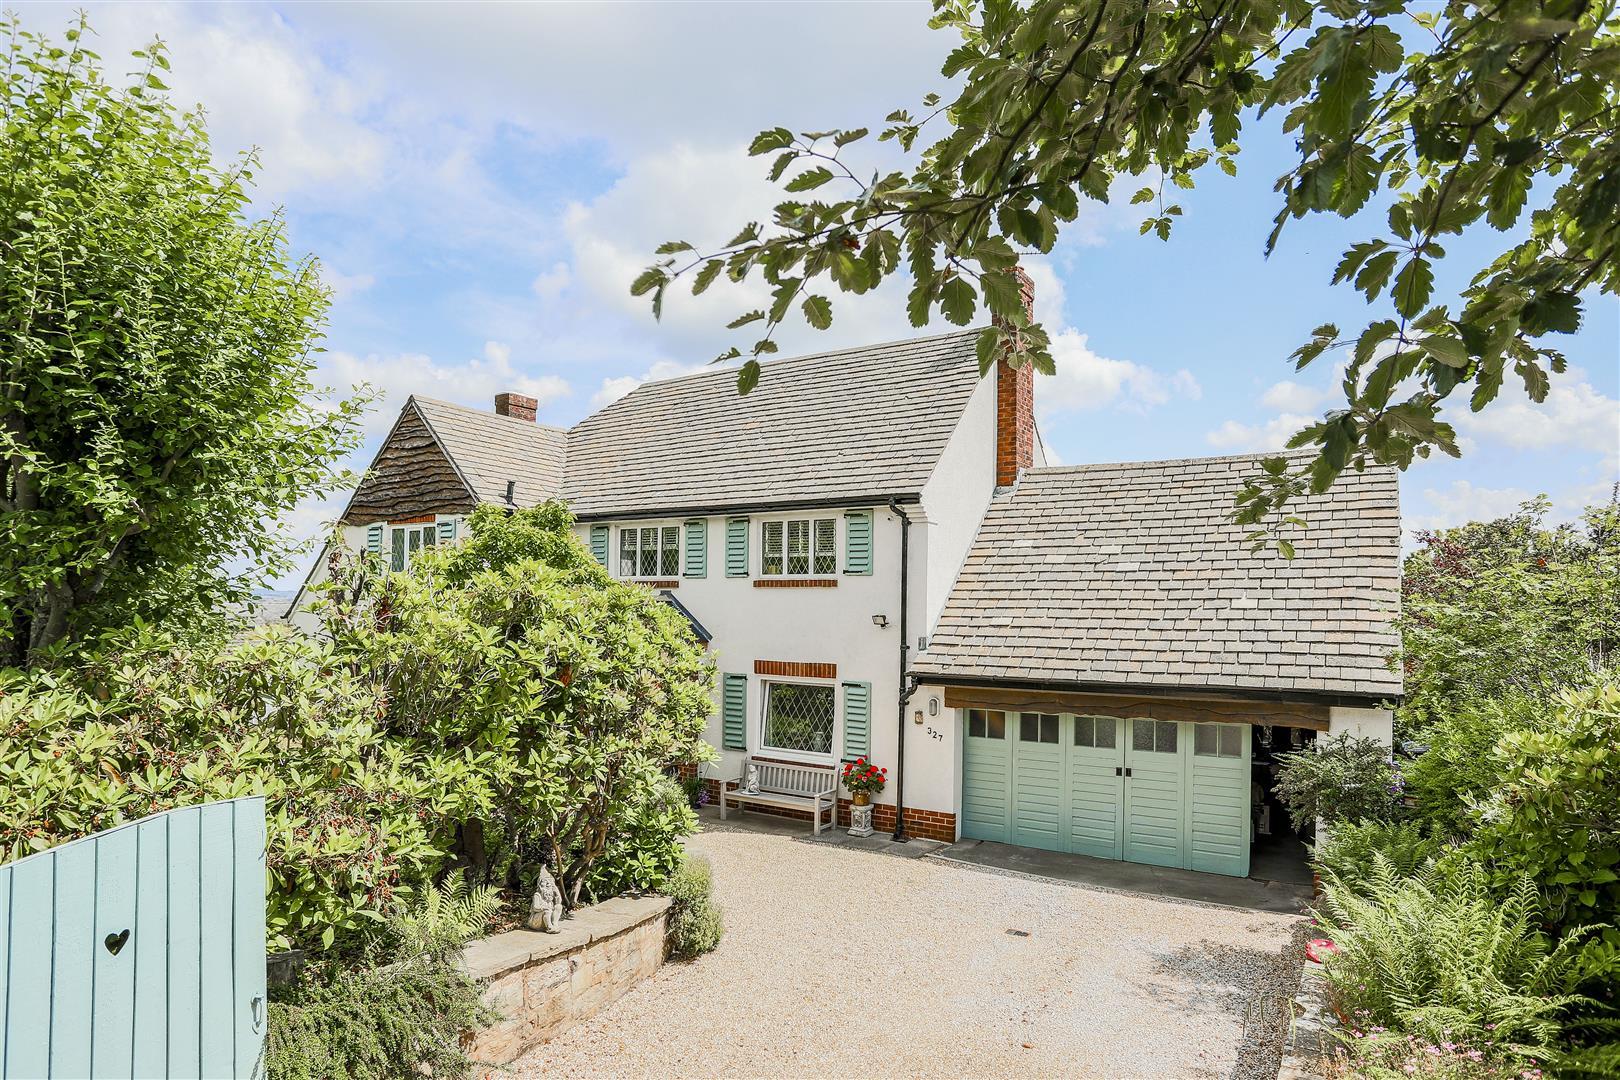 3 Bedroom Detached House For Sale - 1